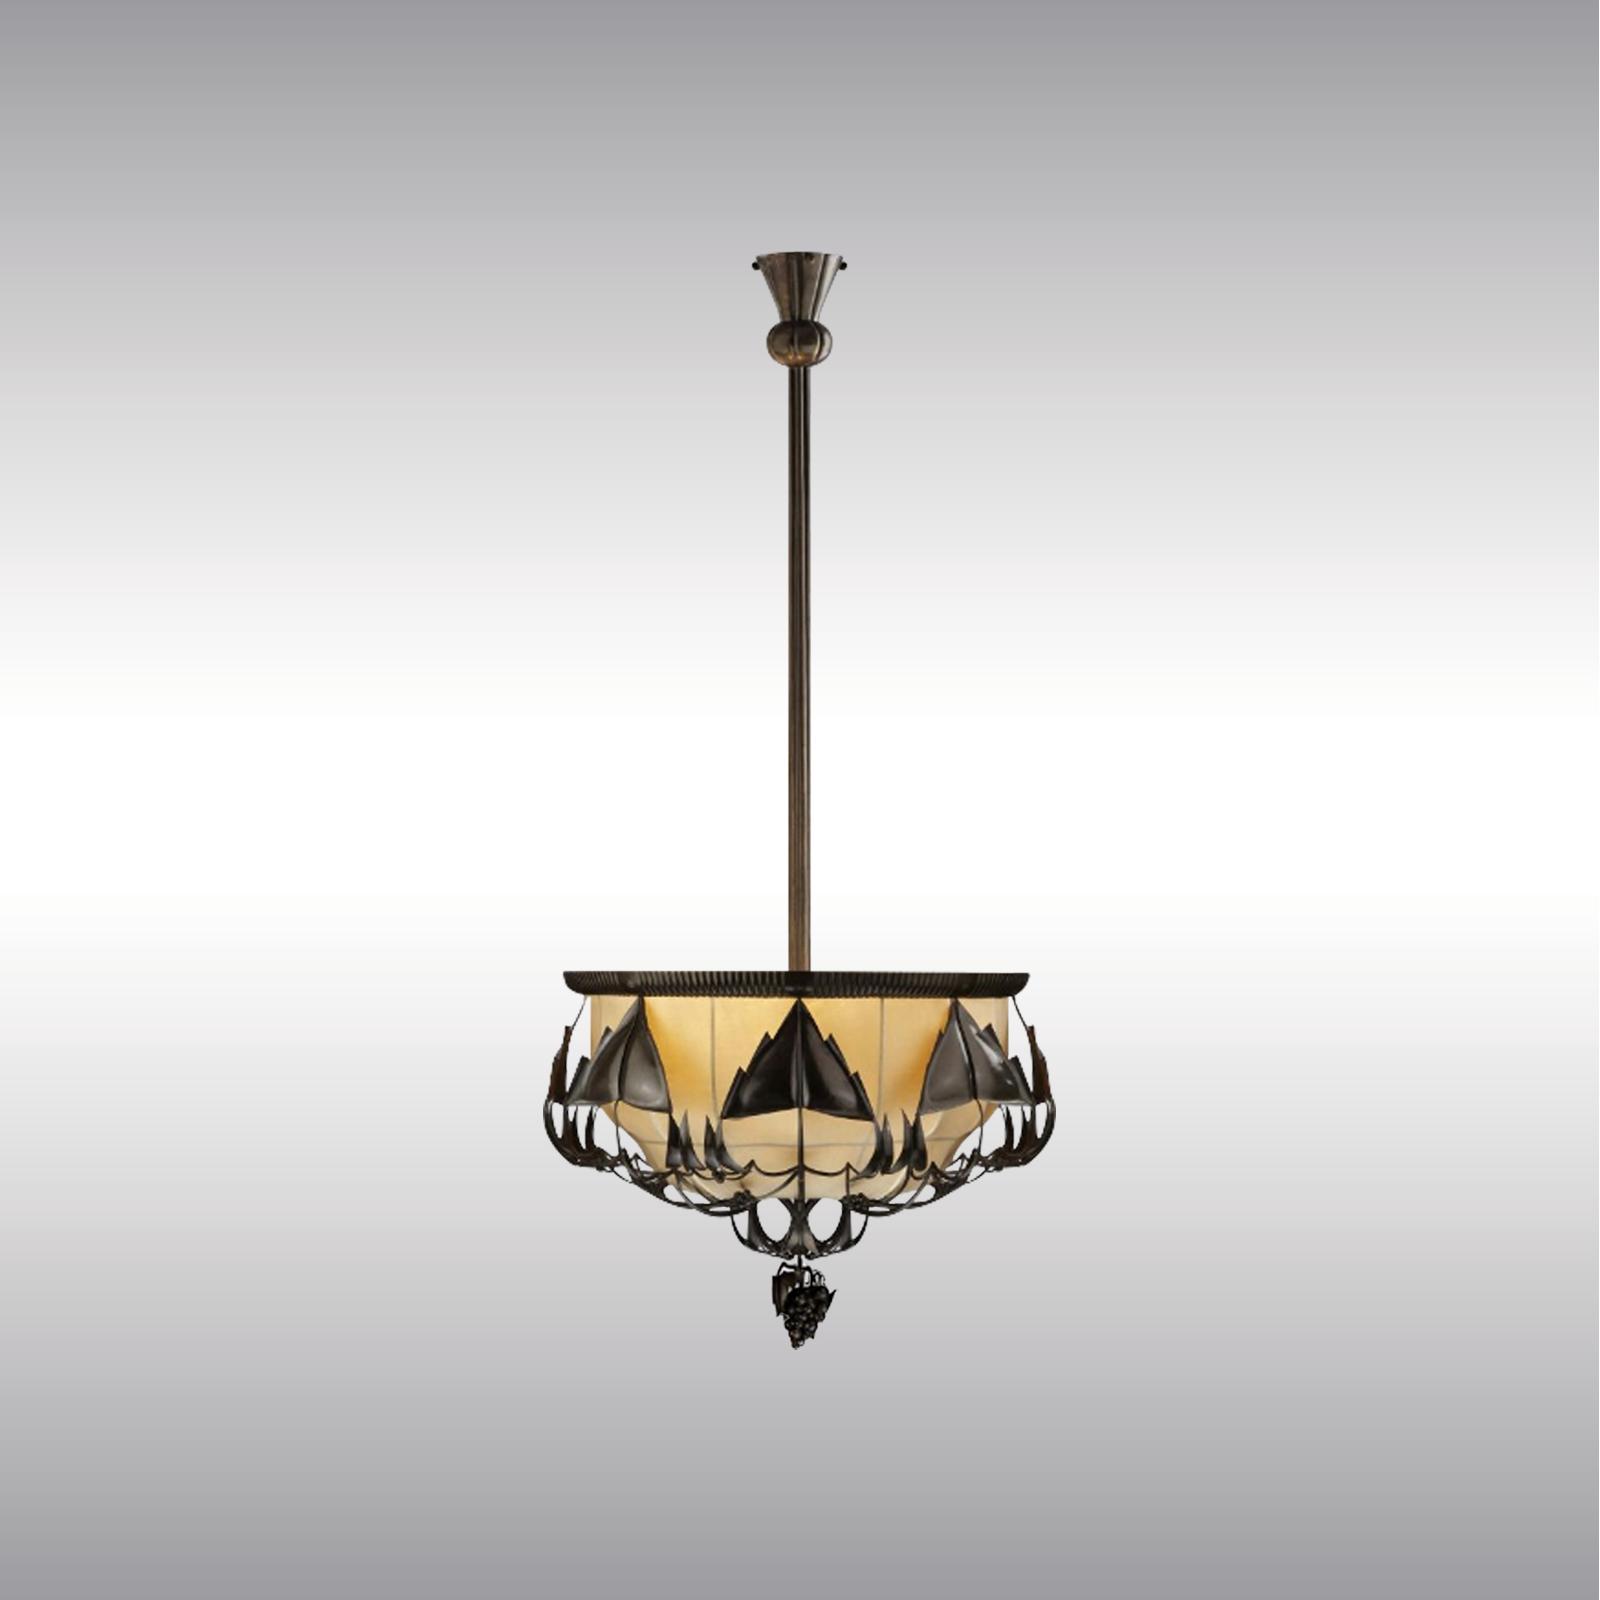 ICFF 2019 Amazing Woka Lamps and Furniture Designs - Dagobert Peche icff ICFF 2019: Amazing Woka Lamps and Furniture Designs ICFF 2019 Amazing Woka Lamps and Furniture Designs Dagobert Peche